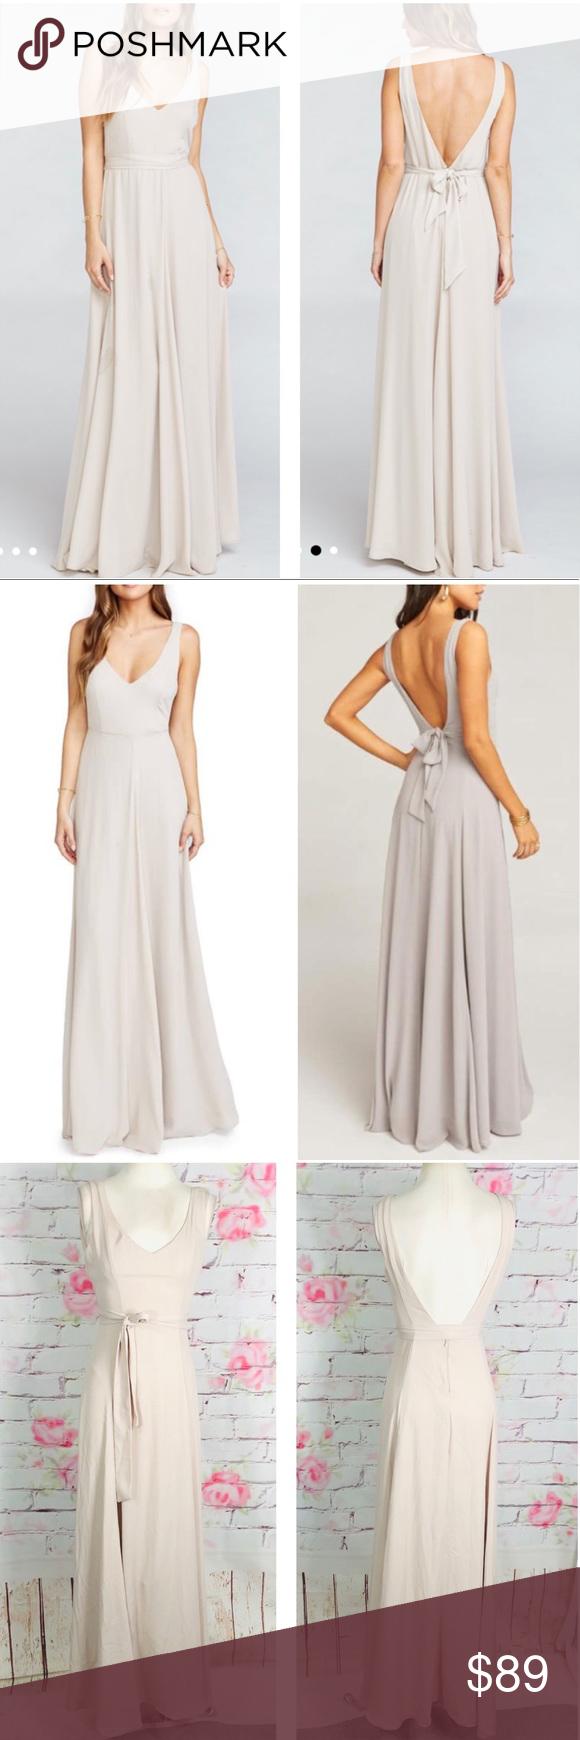 Show Me Your Mumu Jenn Tan Maxi Dress Dresses Maxi Dress Mumu Dress [ 1740 x 580 Pixel ]